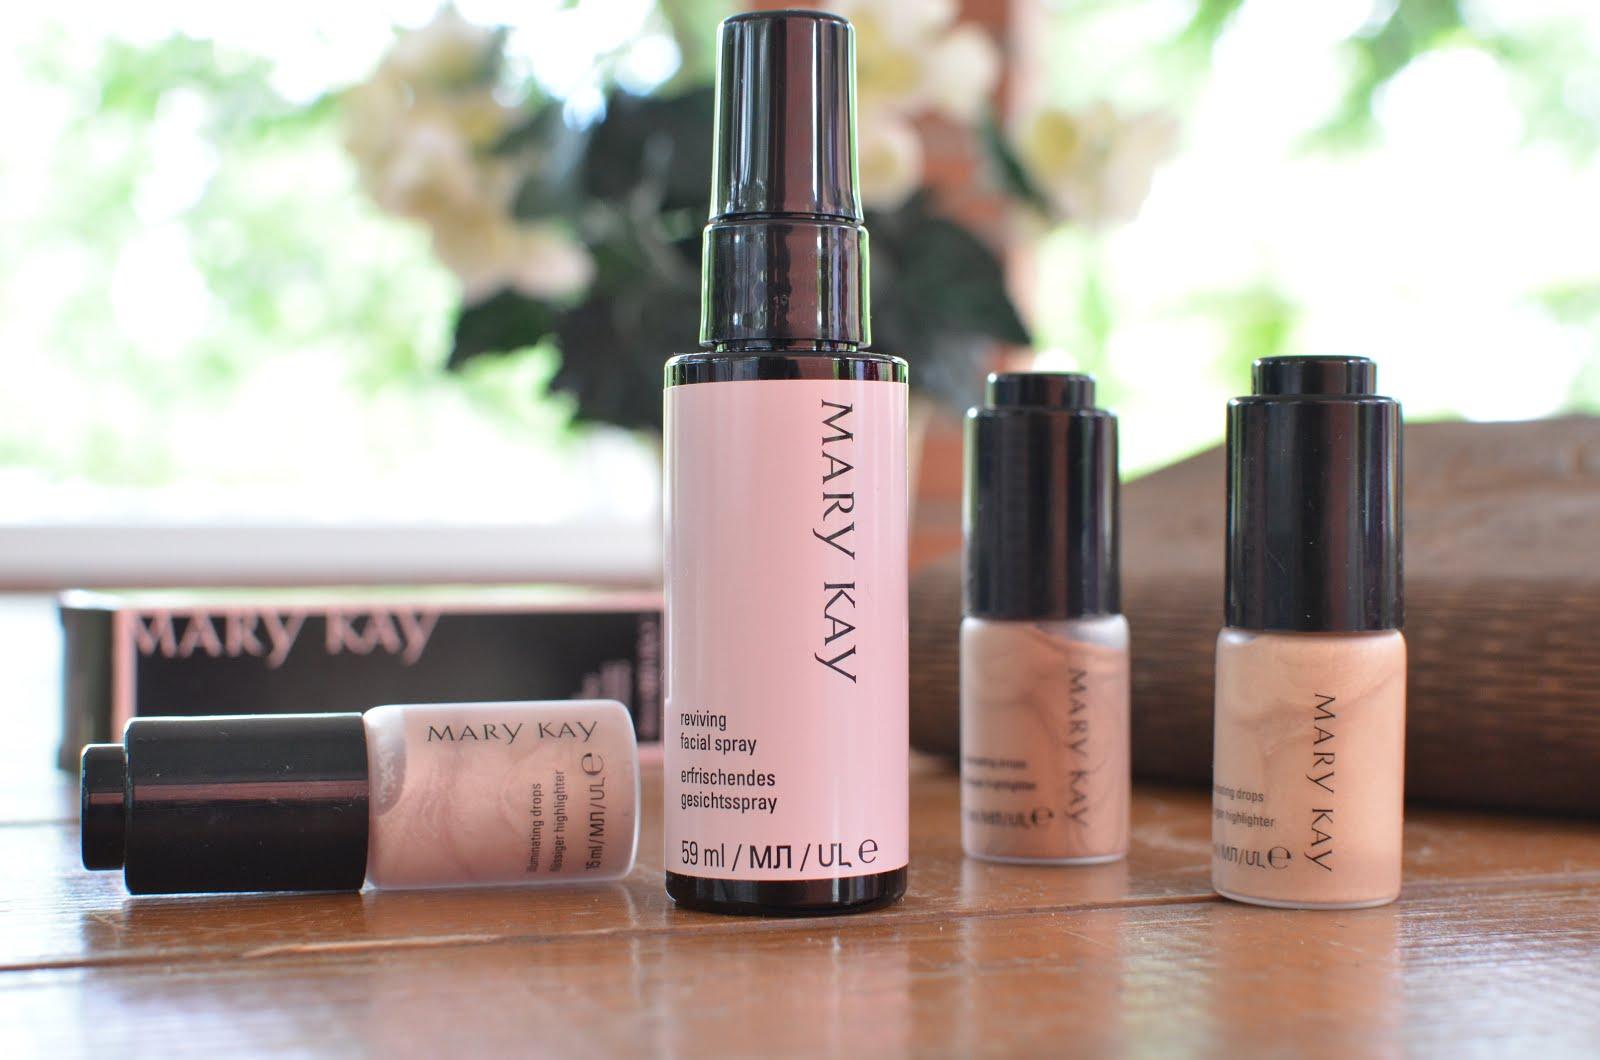 MARY KAY Reviving Facial Spray Освежающий спрей для лица от Skindinavia